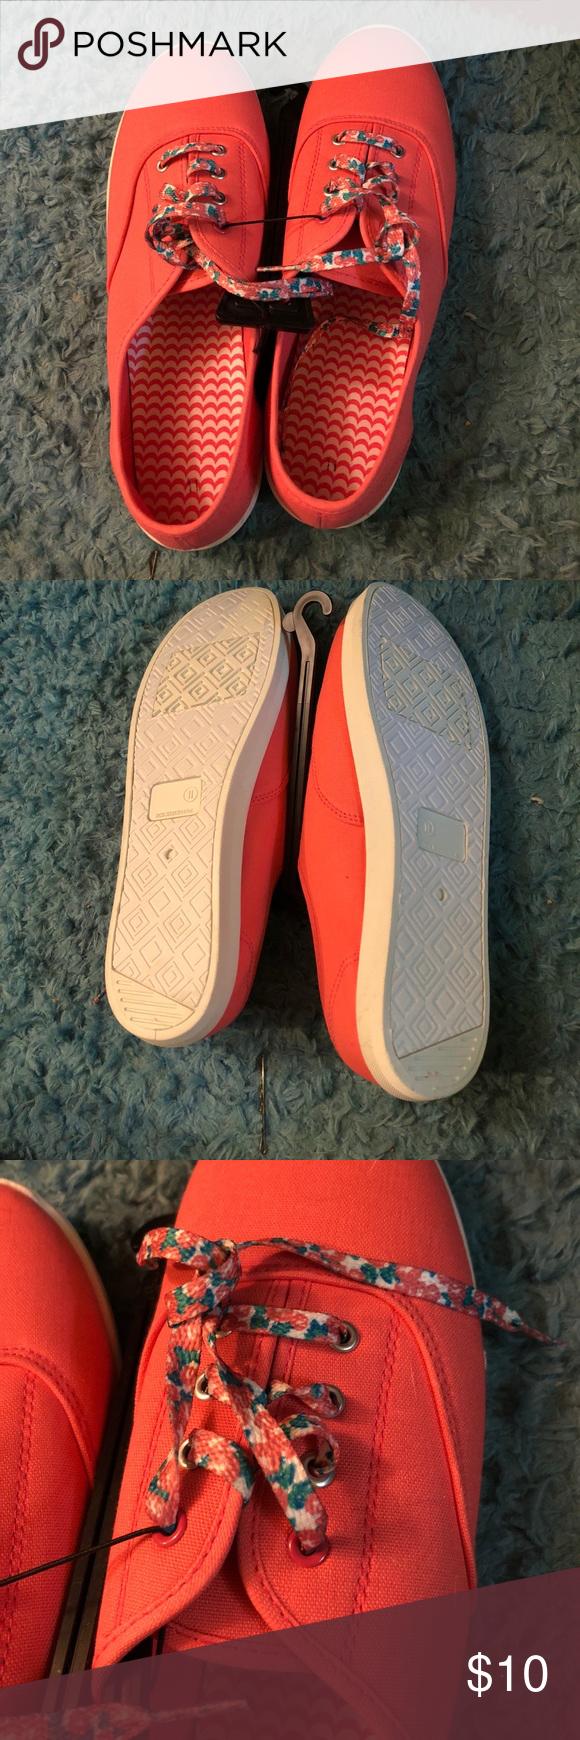 14618ffb1d4177 🆕 Tory Burch Miller neoprene medallion sneakers NWT